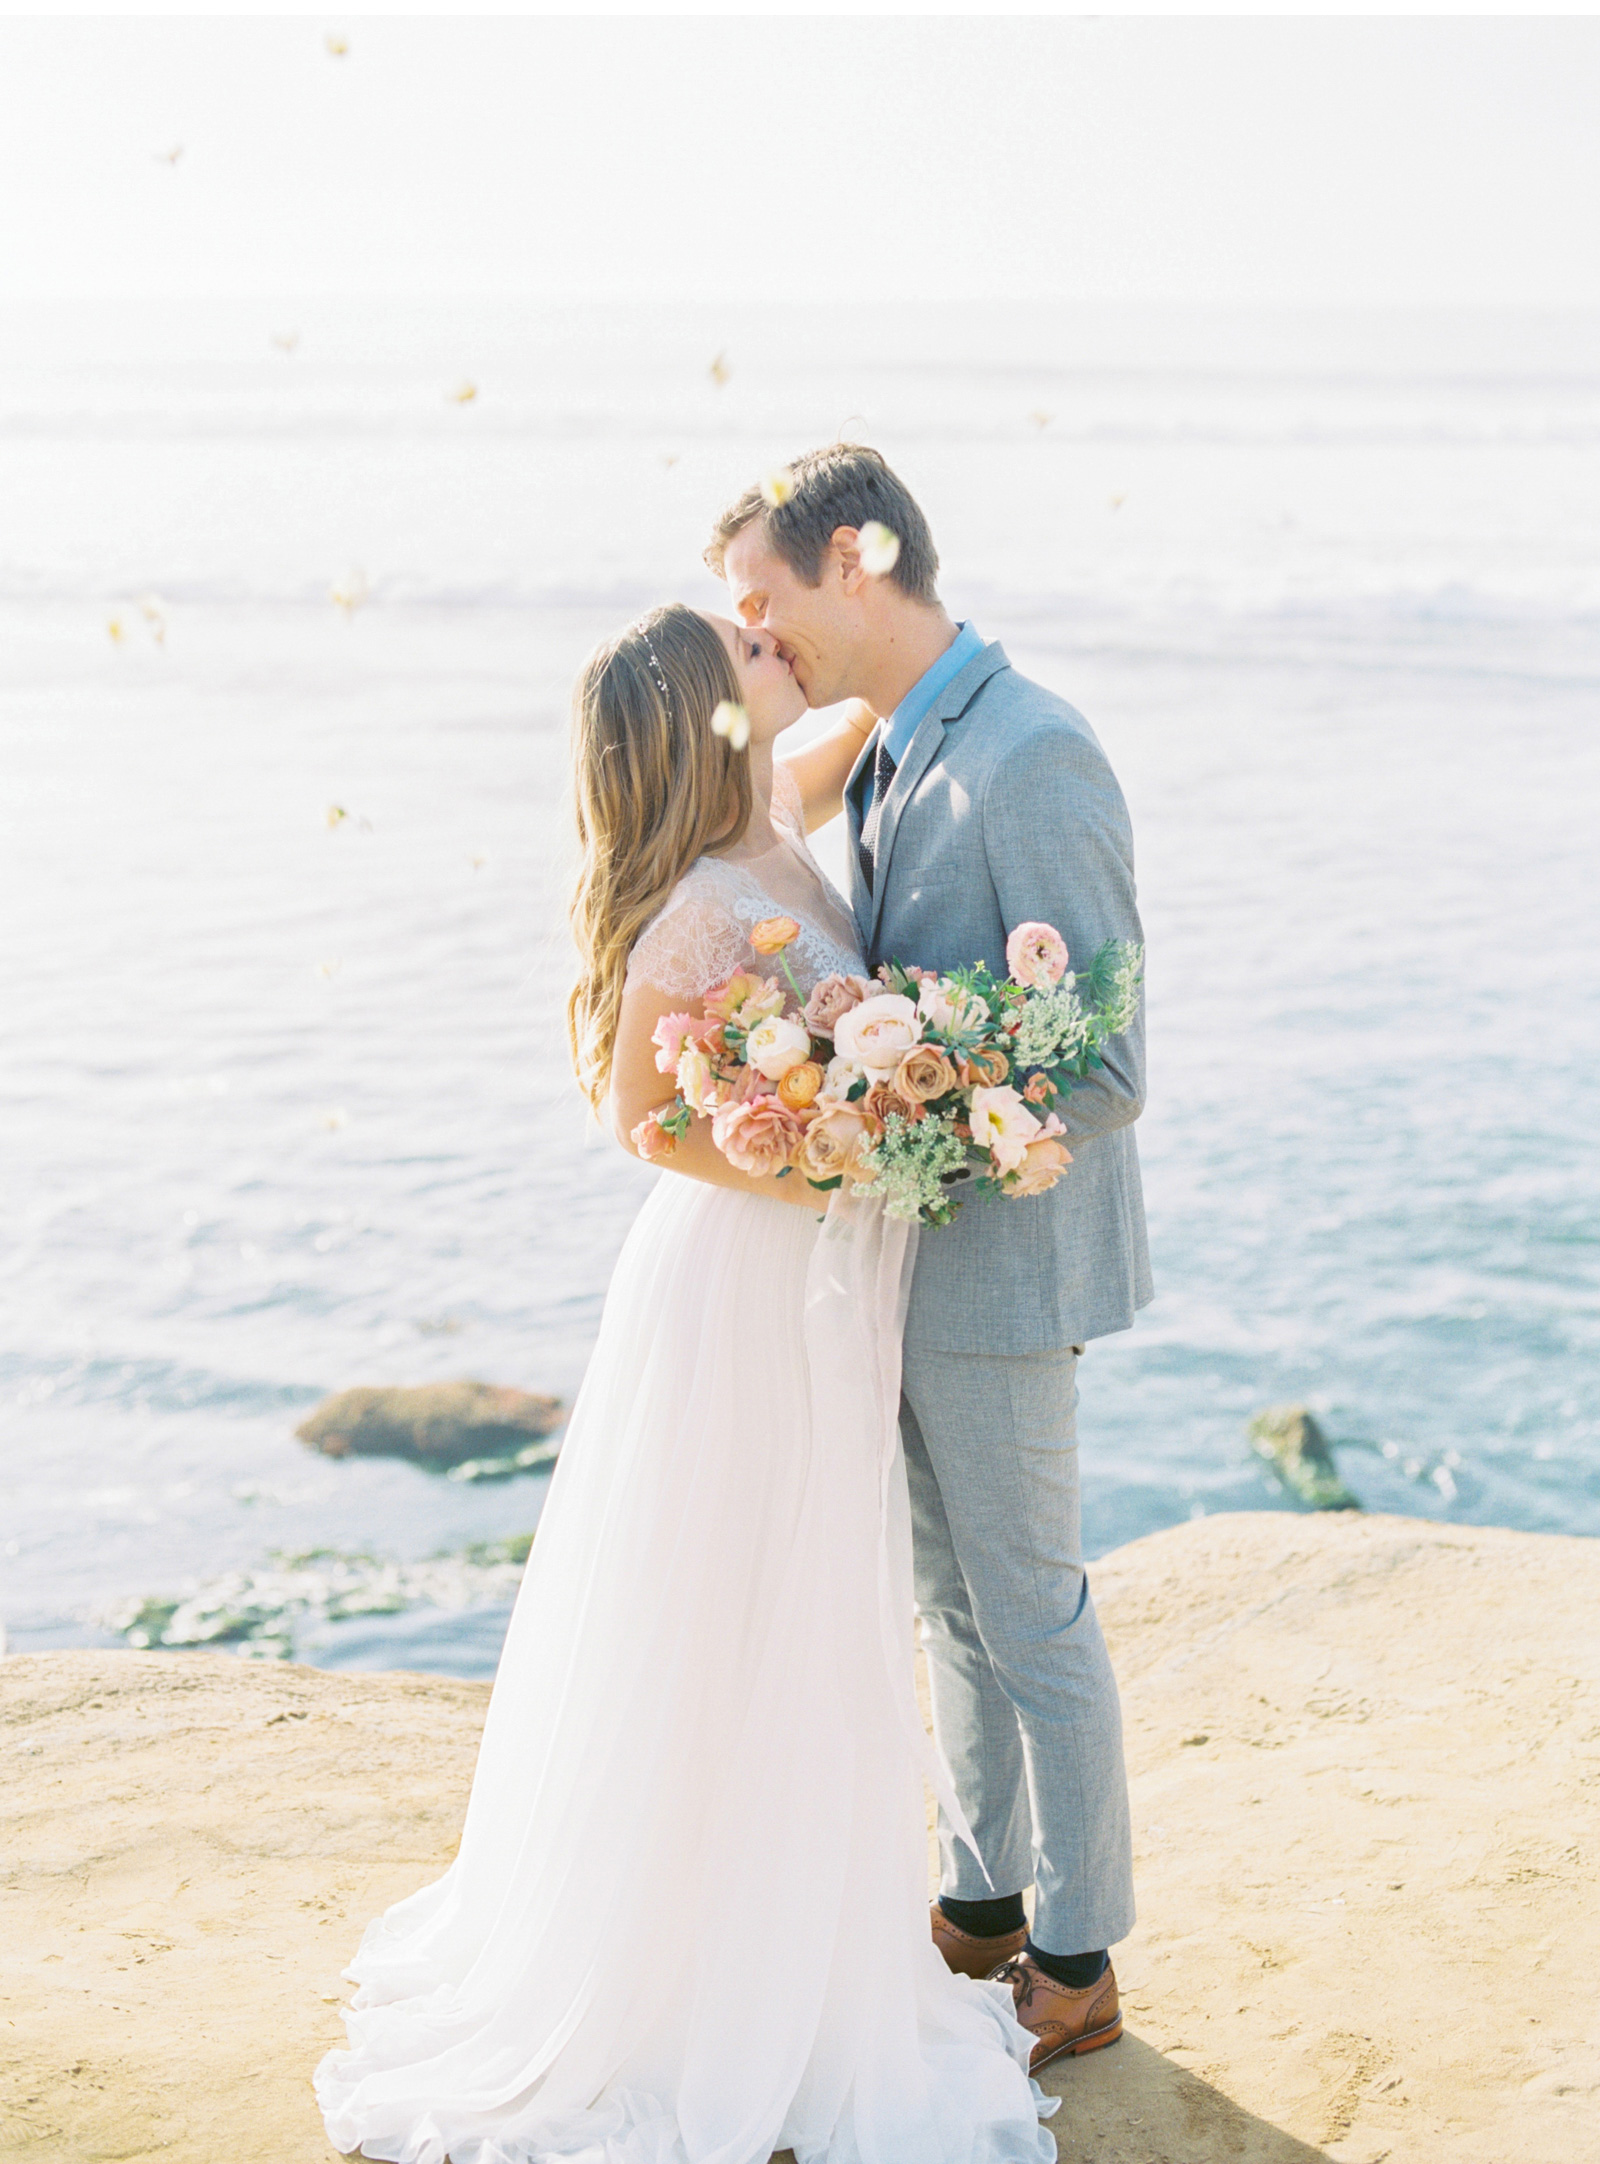 Style-Me-Pretty-California-Beach-Wedding-Natalie-Schutt-Photography_04.jpg